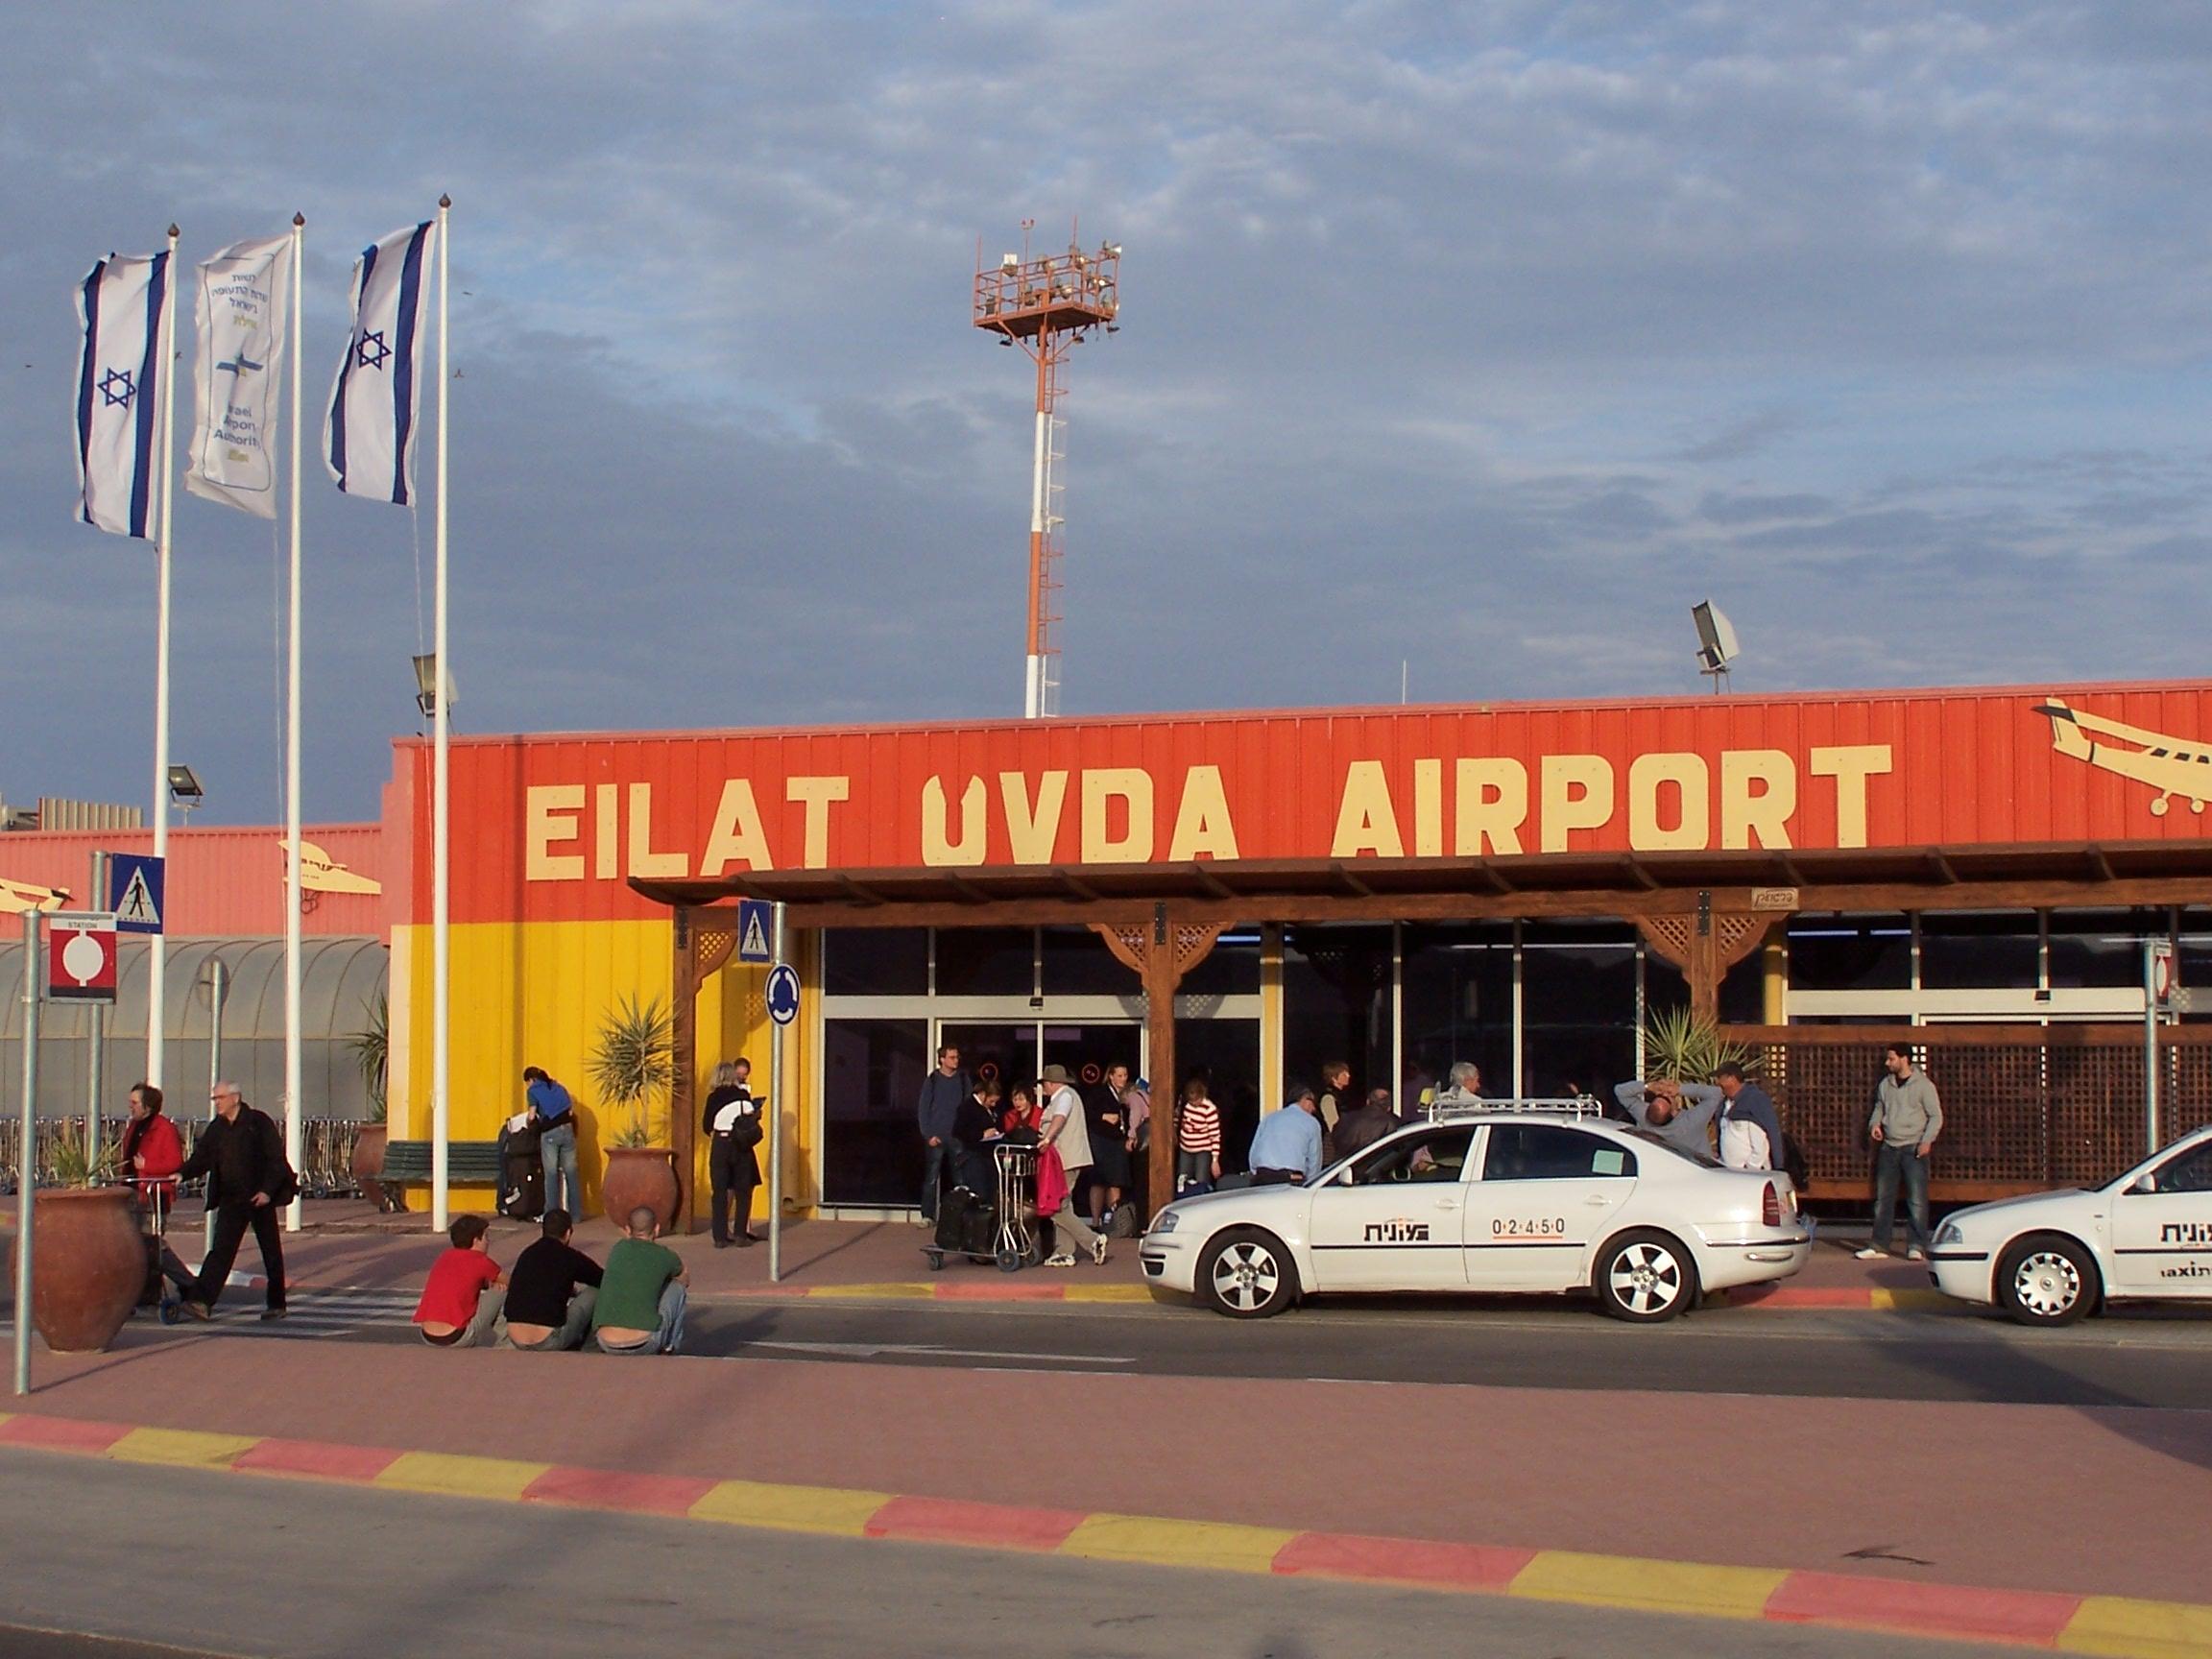 Фото аэропорта Увда Эйлат